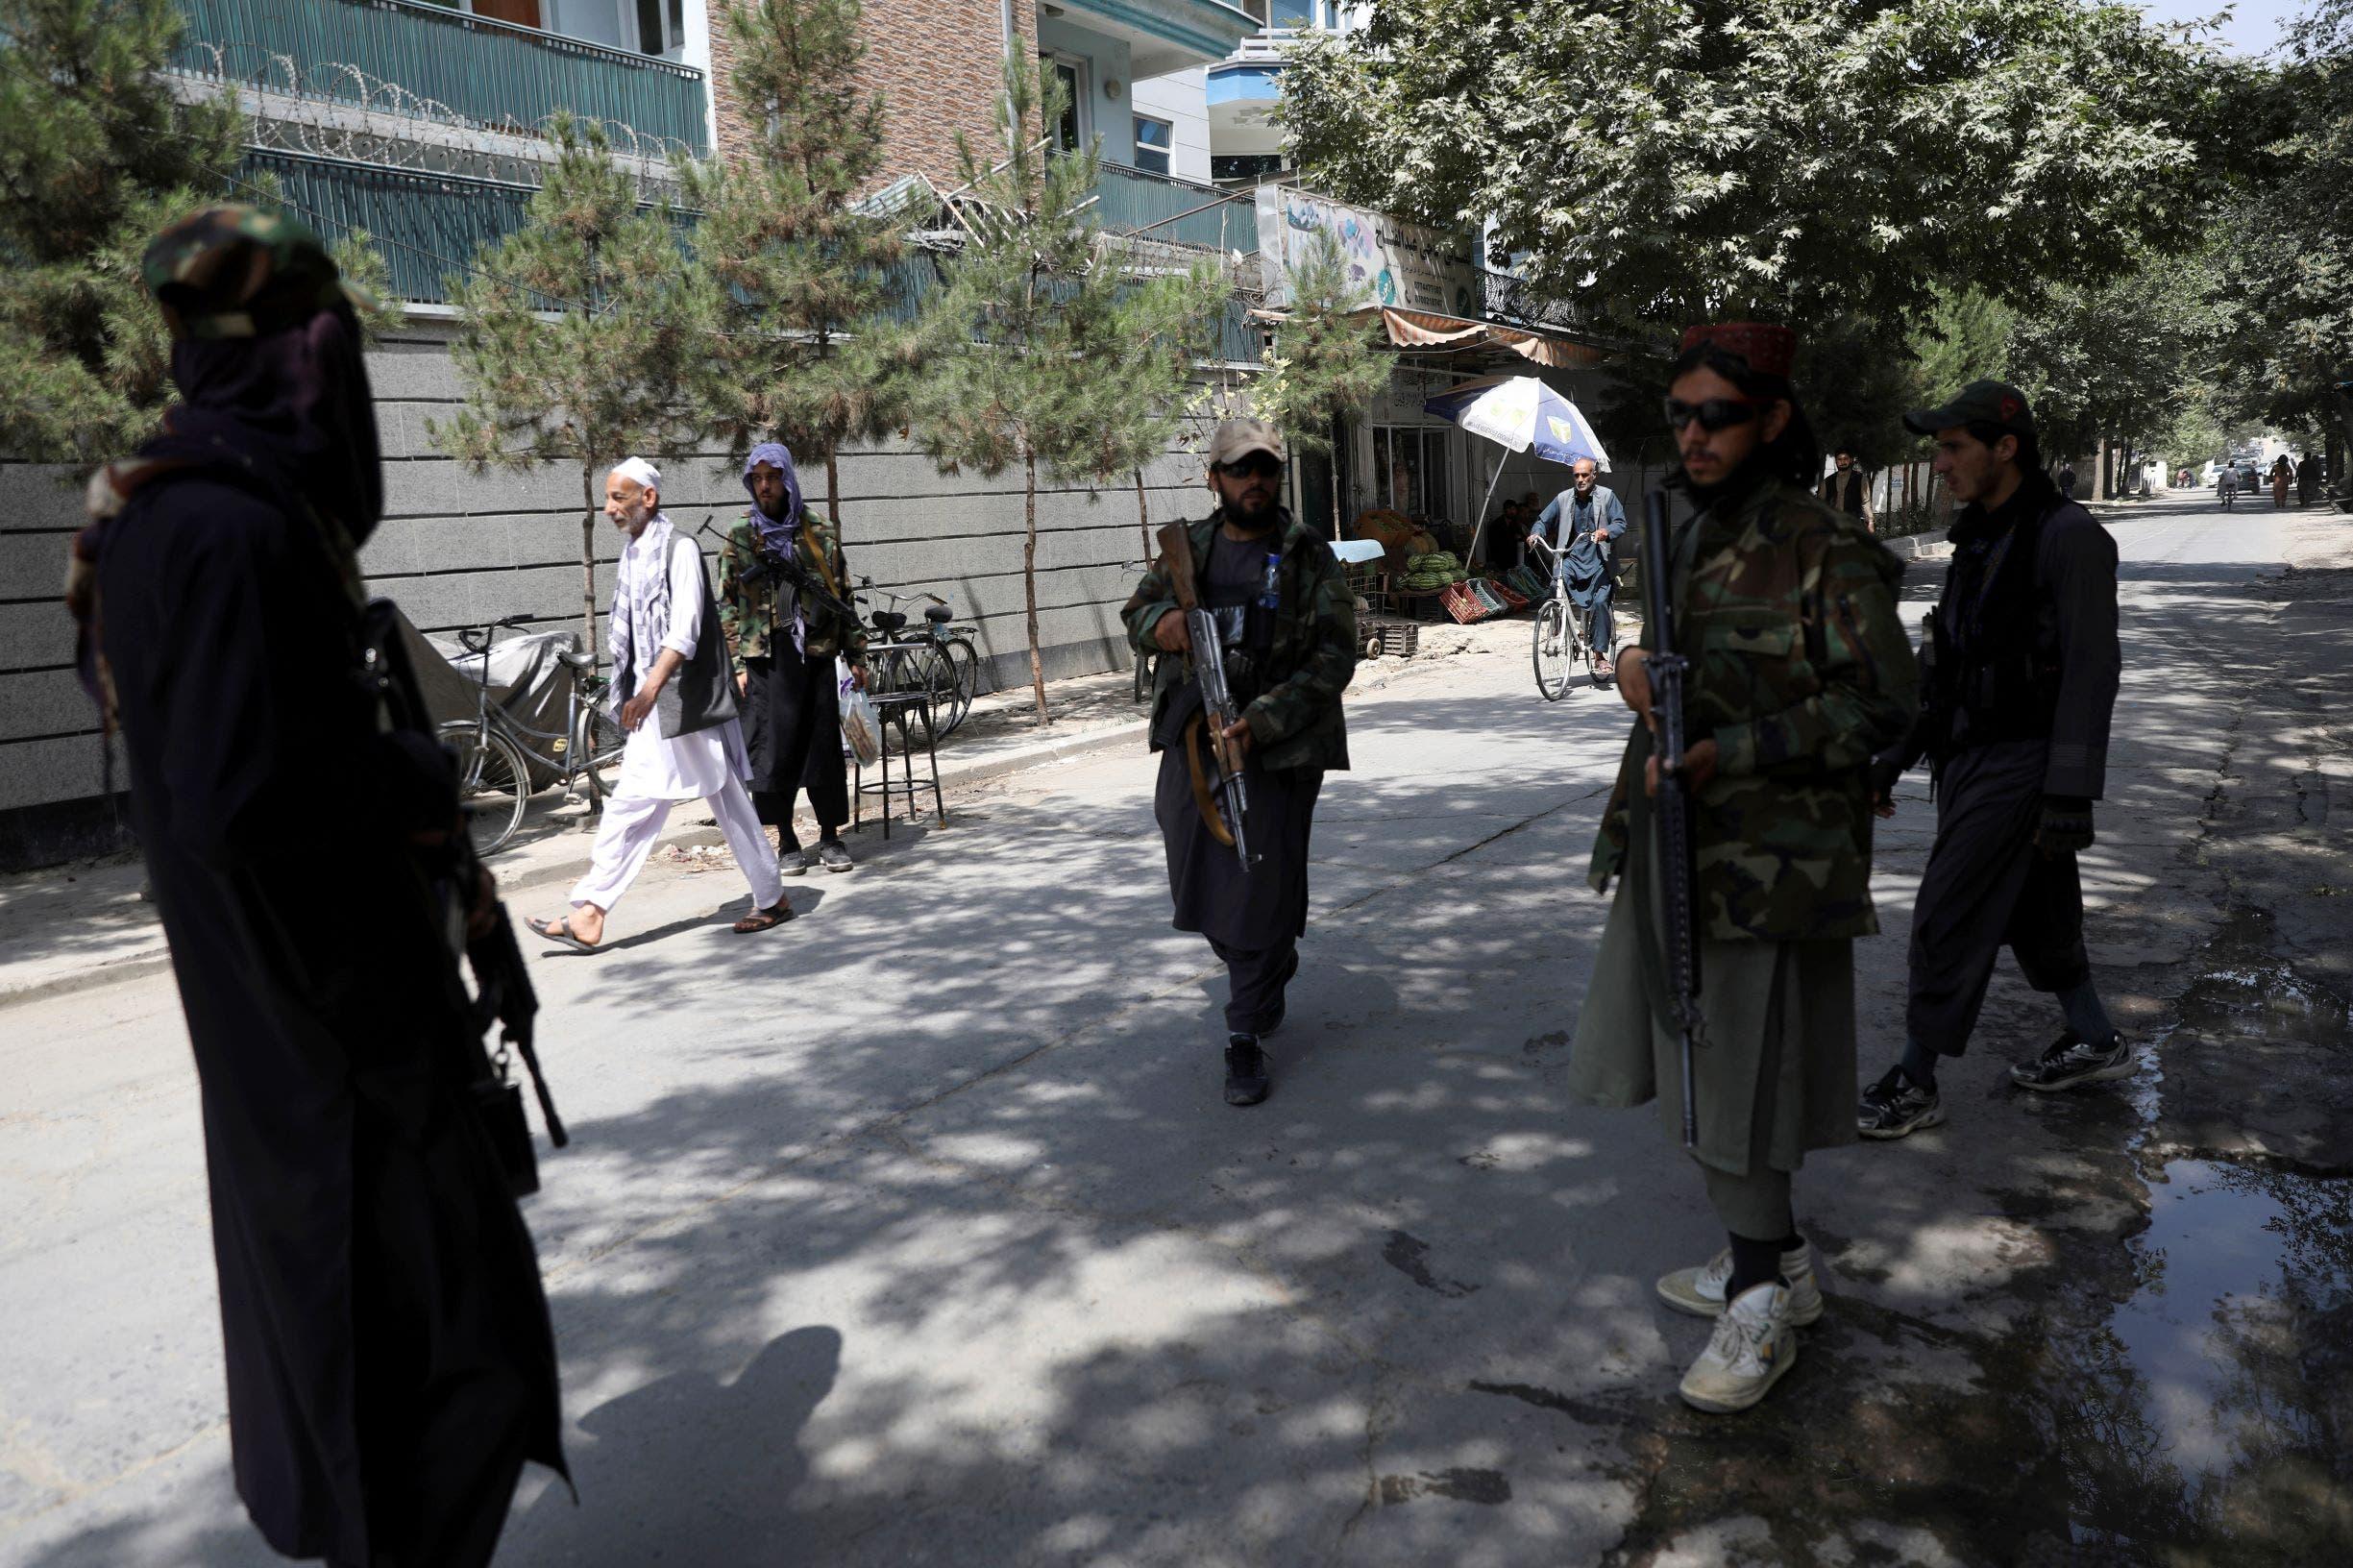 طالبان قرب مطار كابل - أب